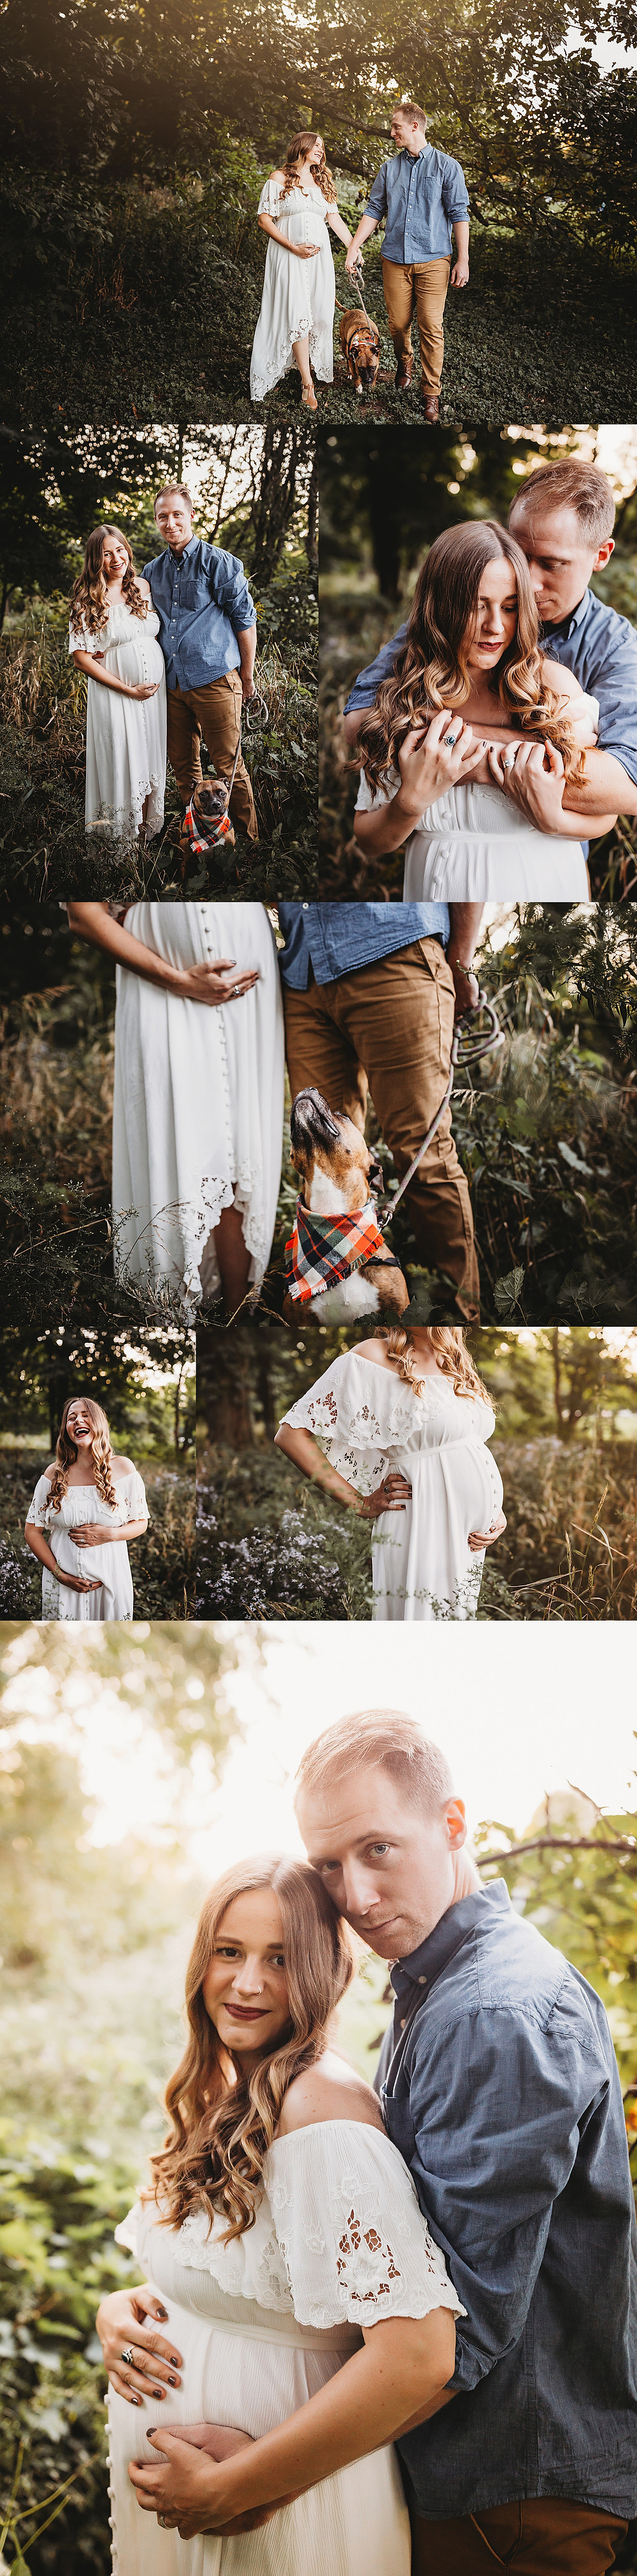 Indianapolis indiana  Maternity Photographer   Alex Morris Design   Baby